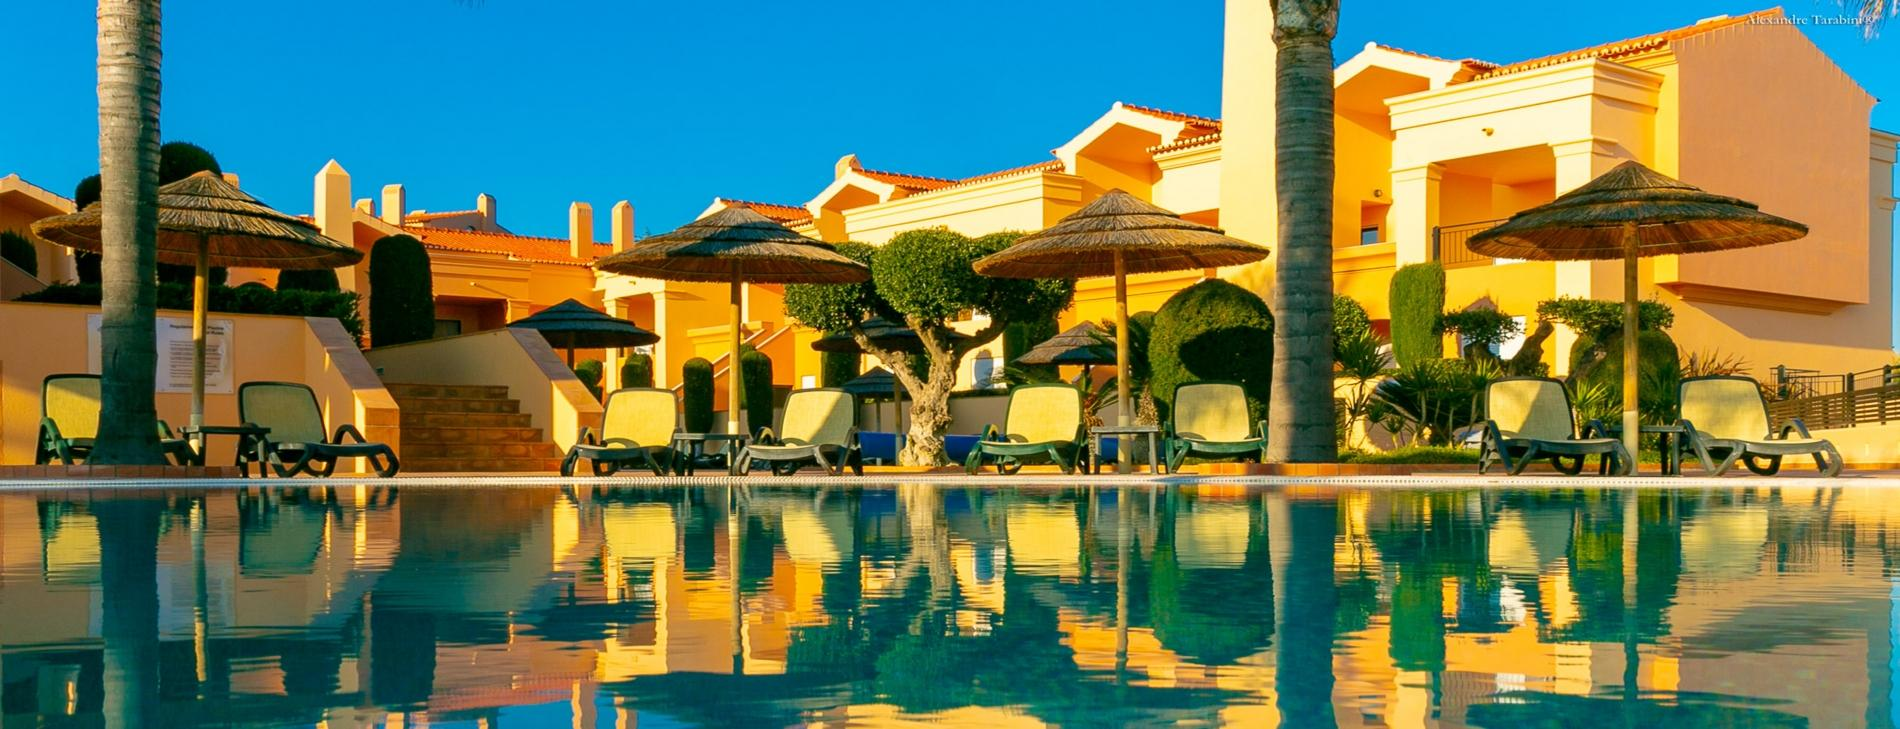 Ferienwohnung B29 - LuzBay Duplex (2558092), Luz, , Algarve, Portugal, Bild 37